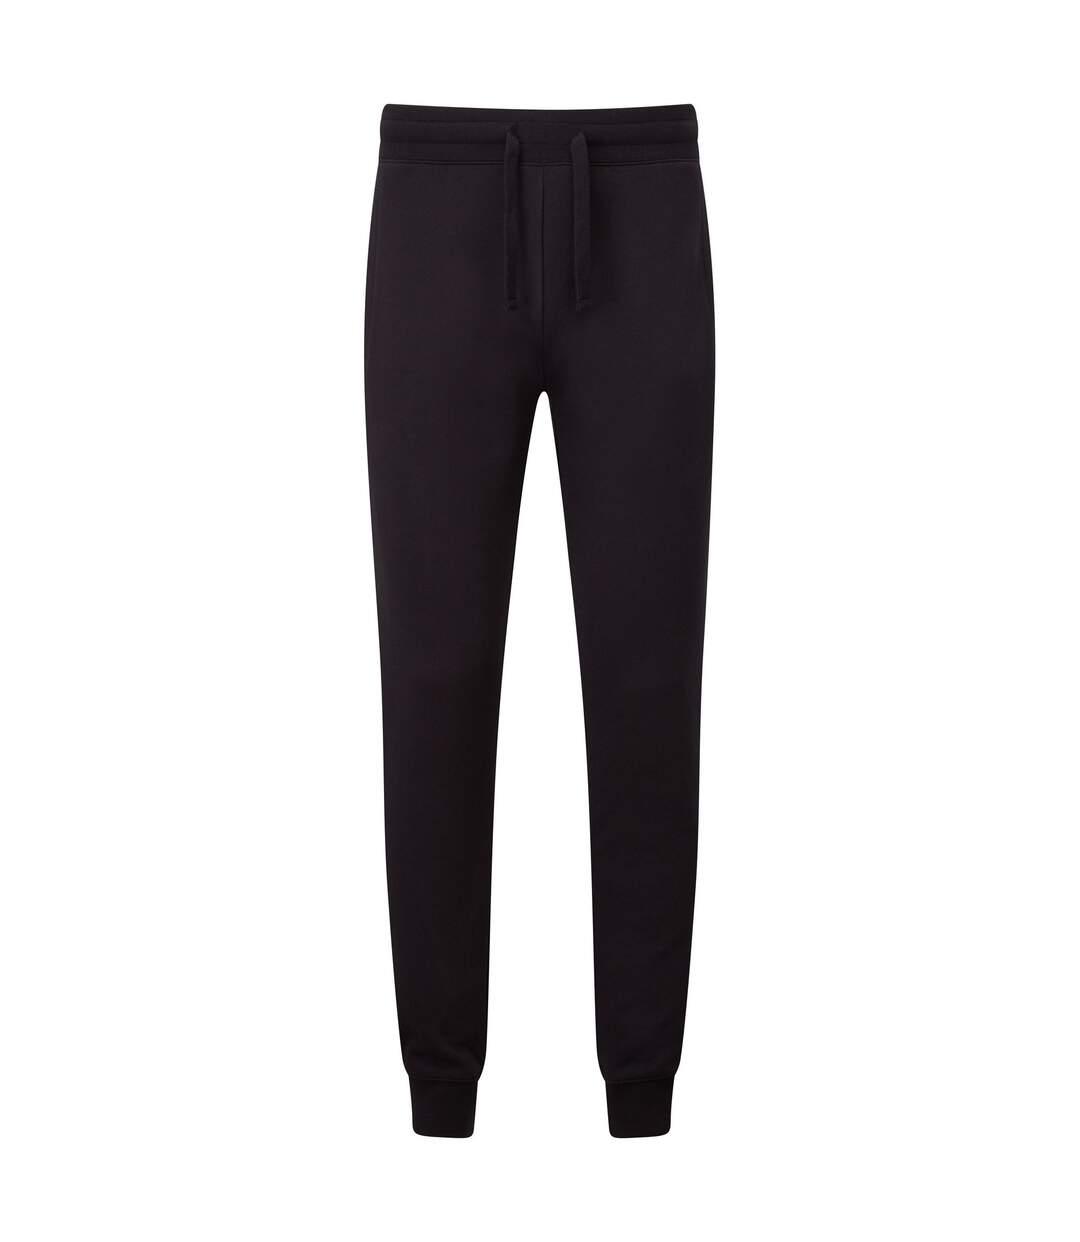 Russell Mens Authentic Jogging Bottoms (Black) - UTRW5508